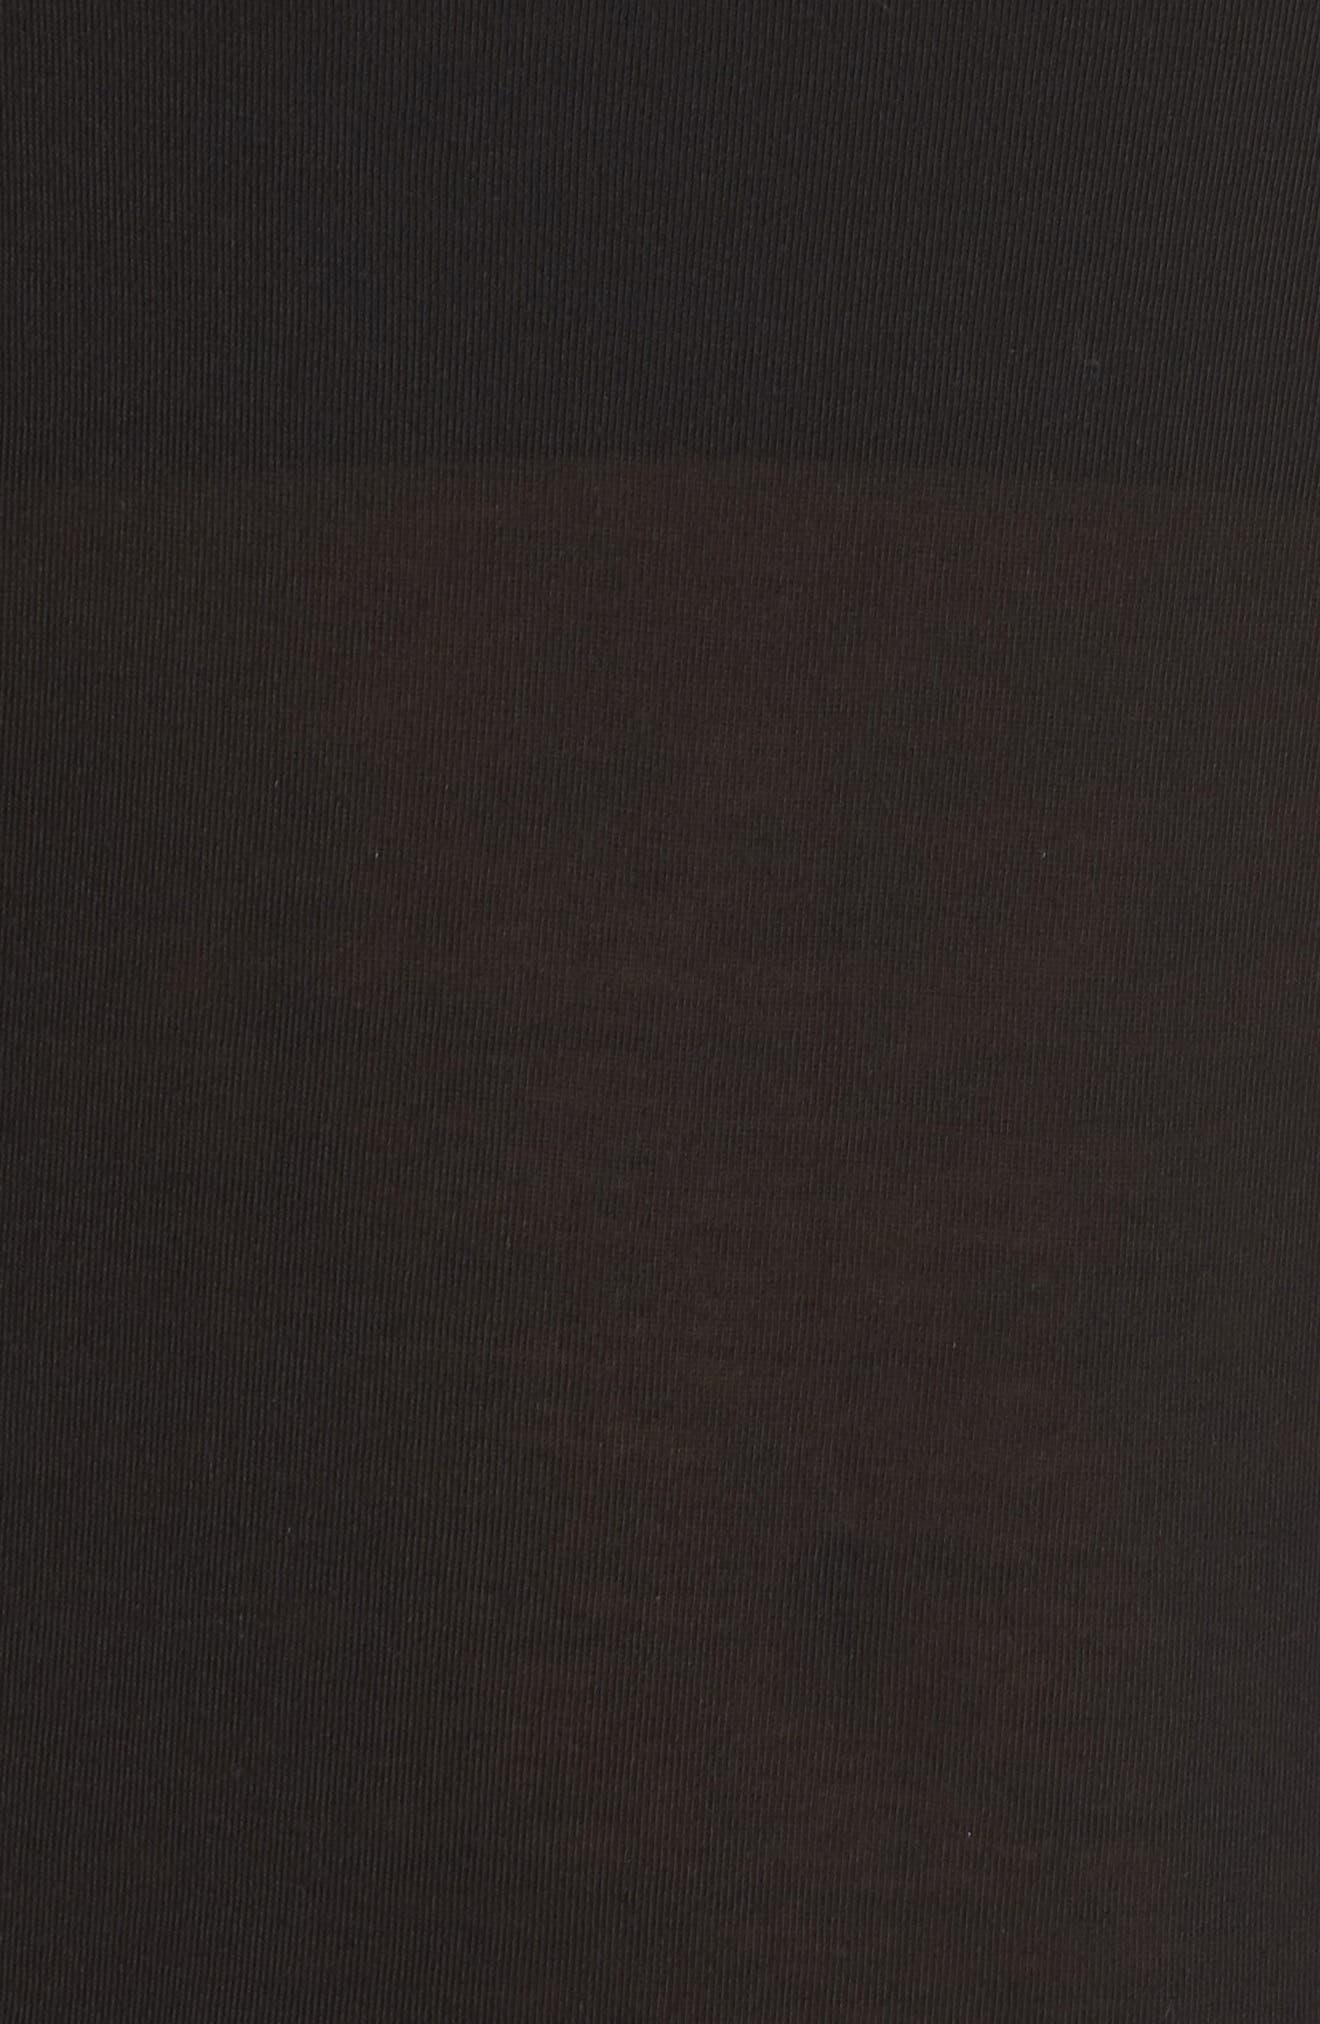 Jump Tank,                             Alternate thumbnail 6, color,                             Black/ Weave